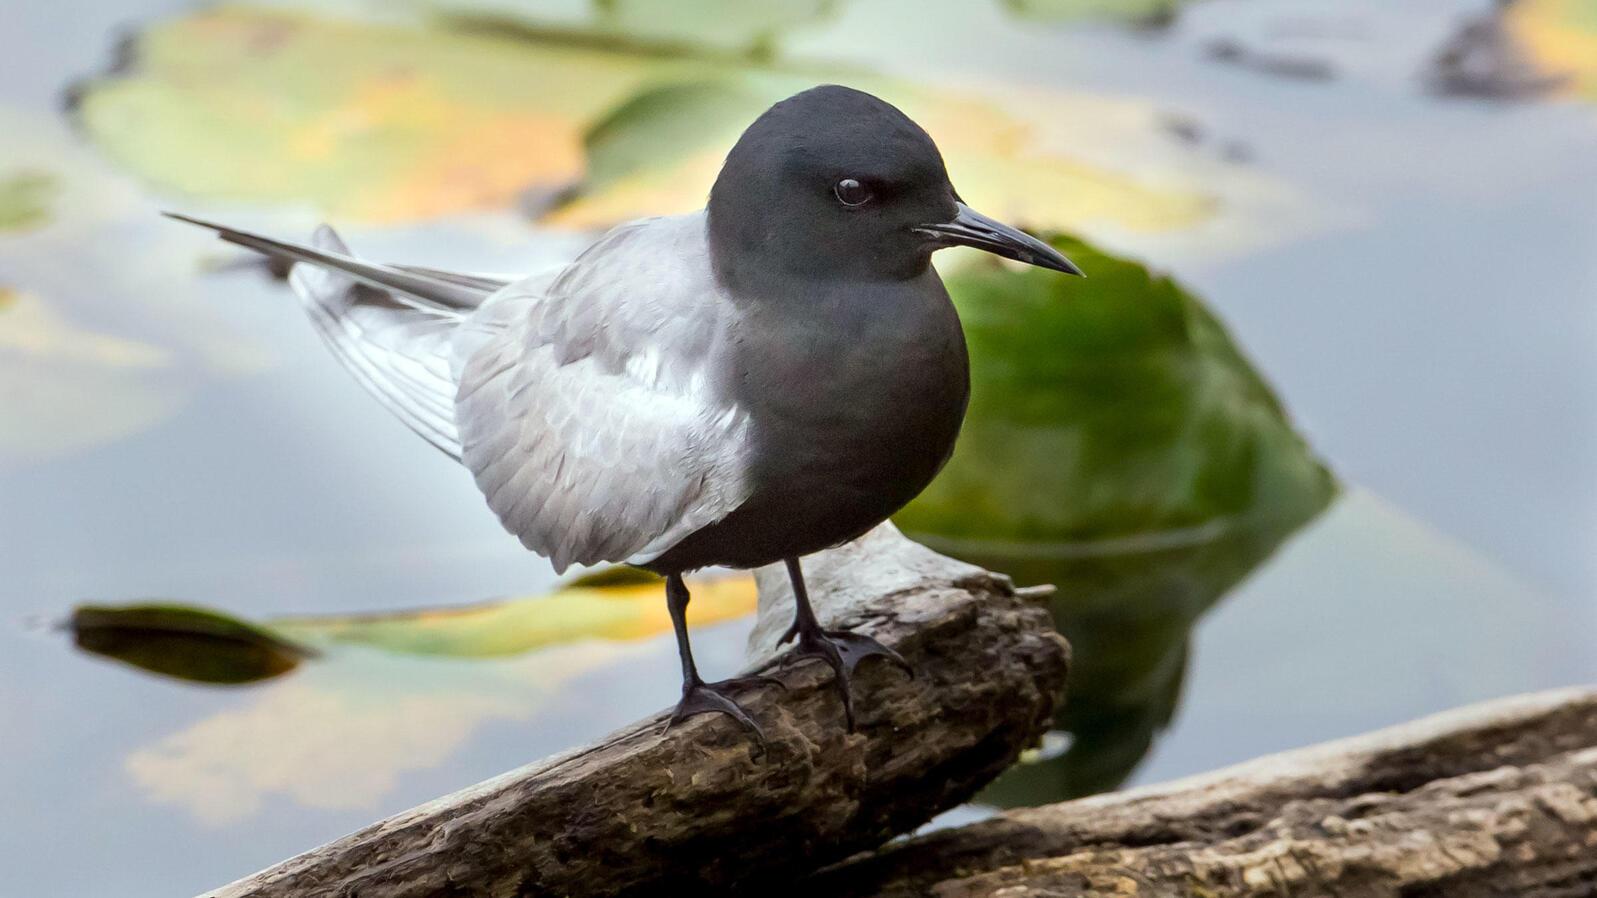 Black Tern. Black Tern. Mick Thompson/Flickr (CC BY NC 2.0)